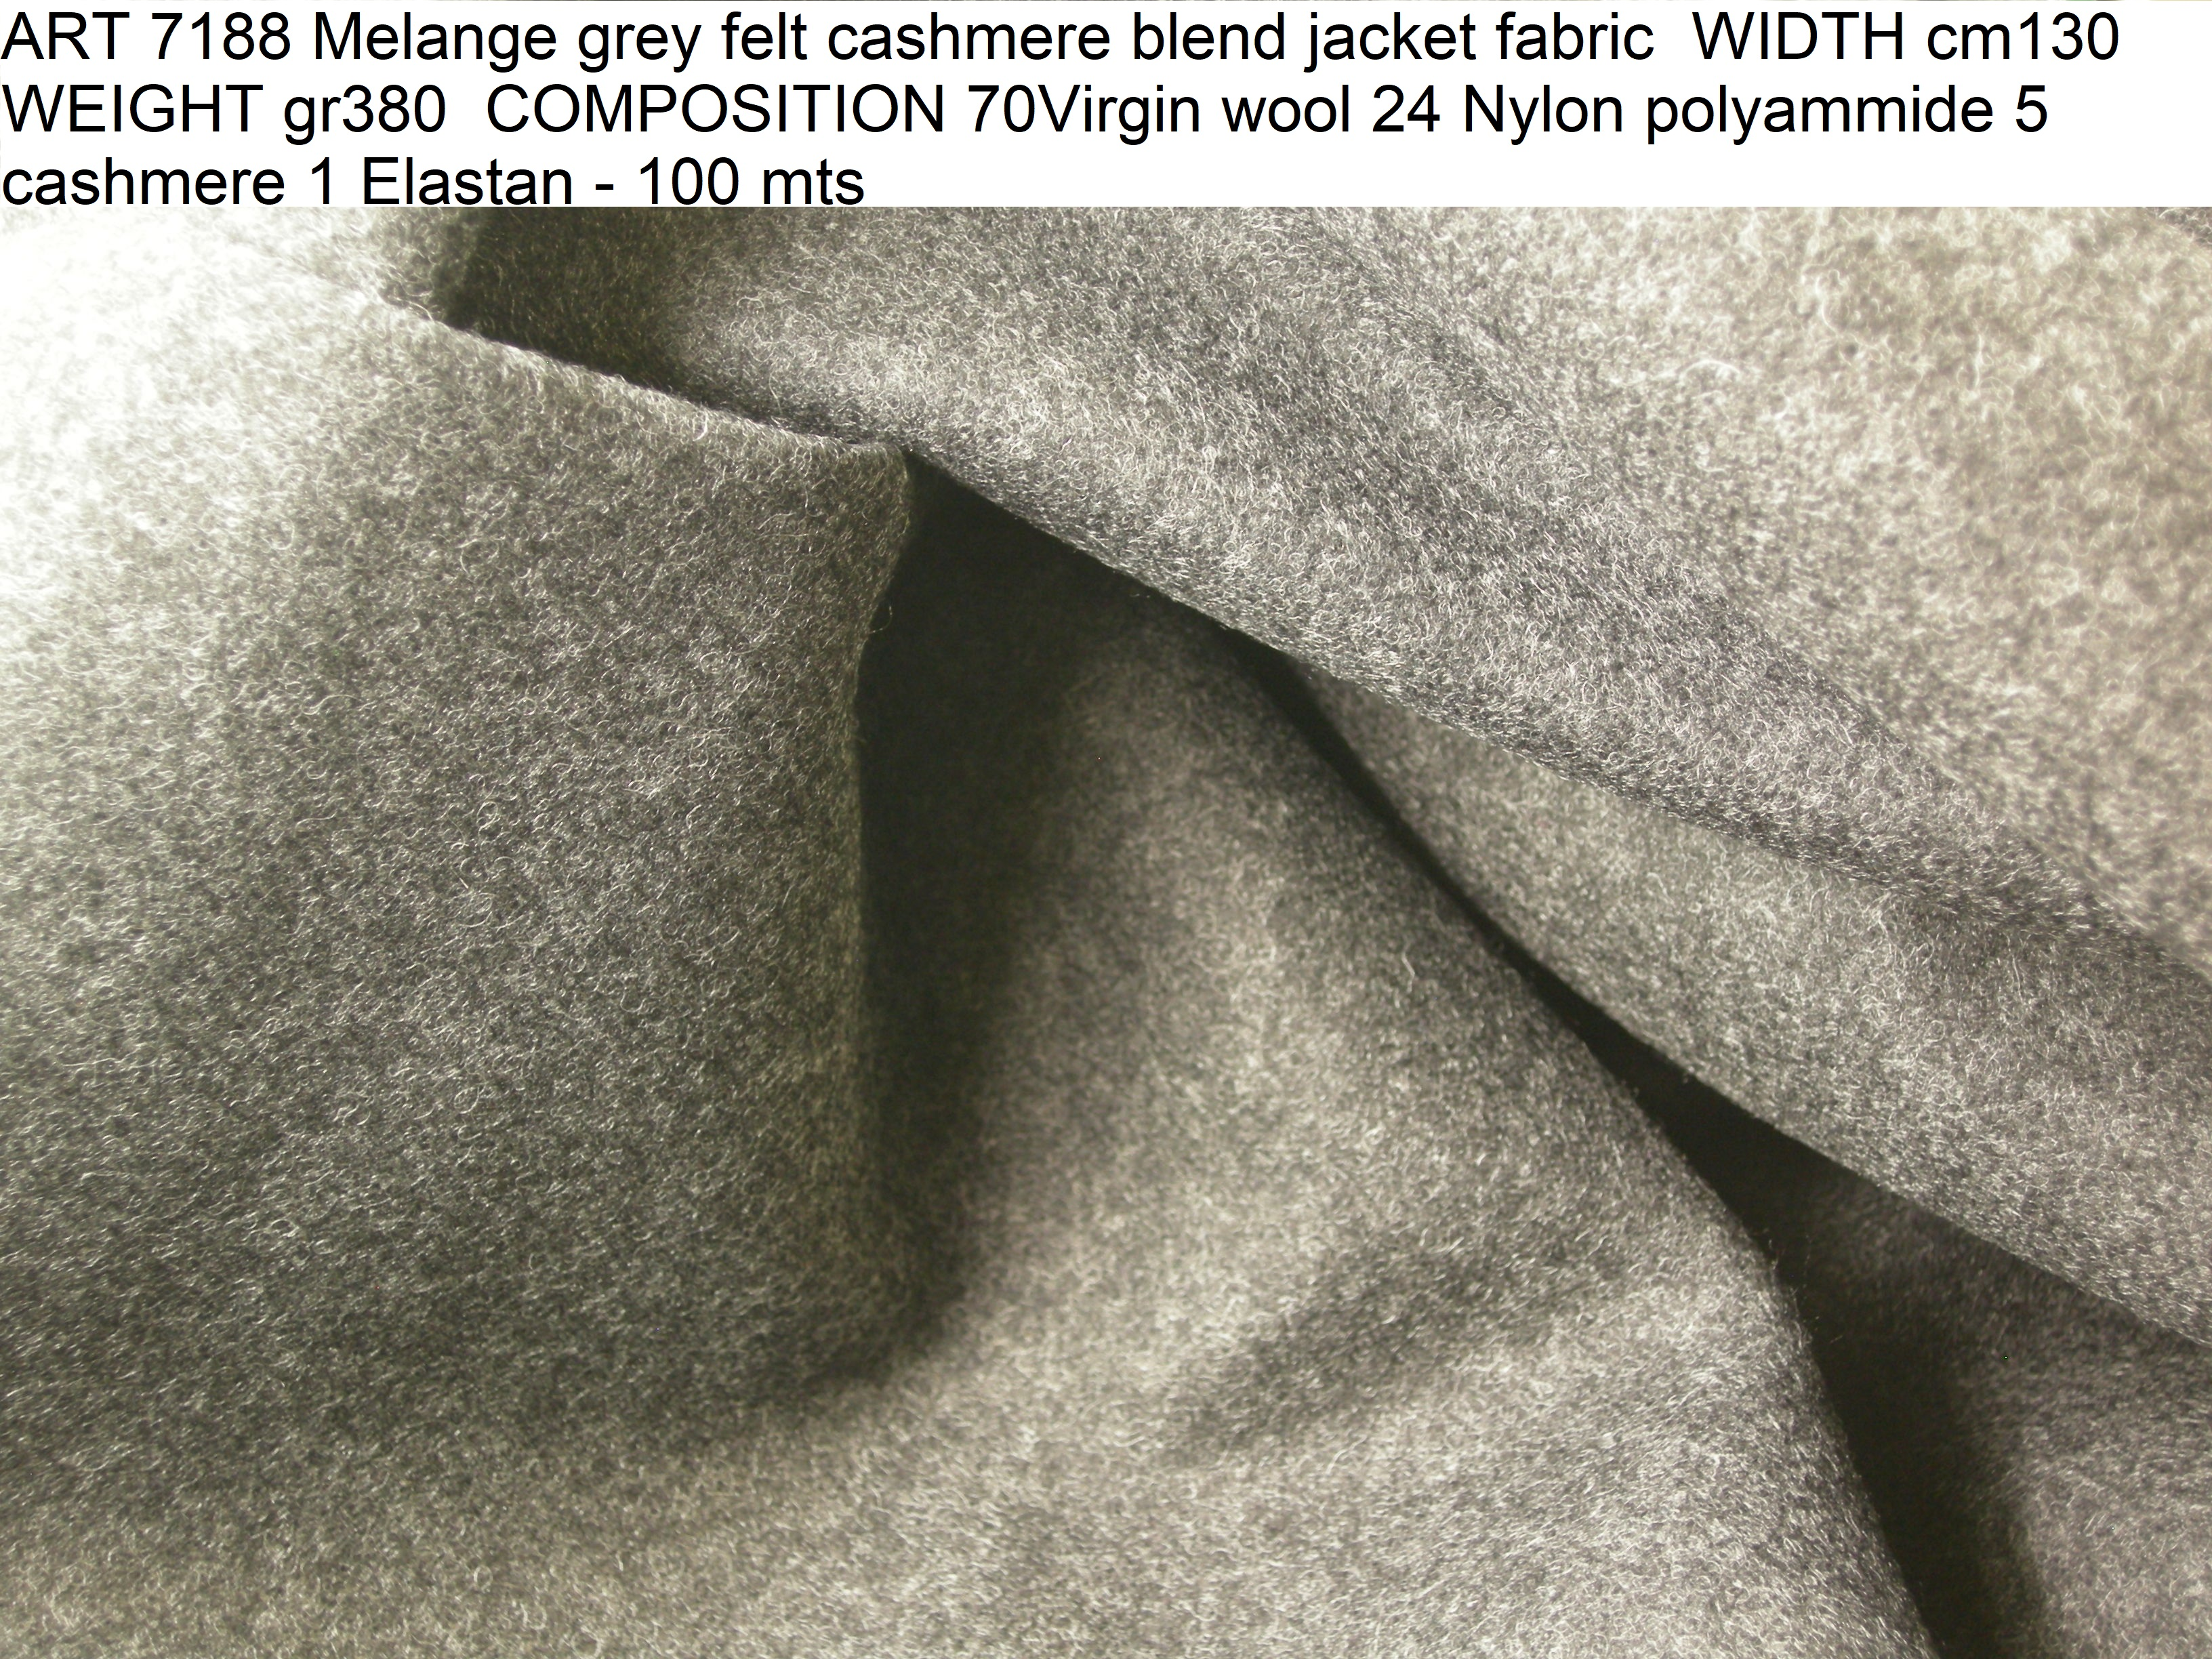 ART 7188 Melange grey felt cashmere blend jacket fabric WIDTH cm130 WEIGHT gr380 COMPOSITION 70Virgin wool 24 Nylon polyammide 5 cashmere 1 Elastan - 100 mts